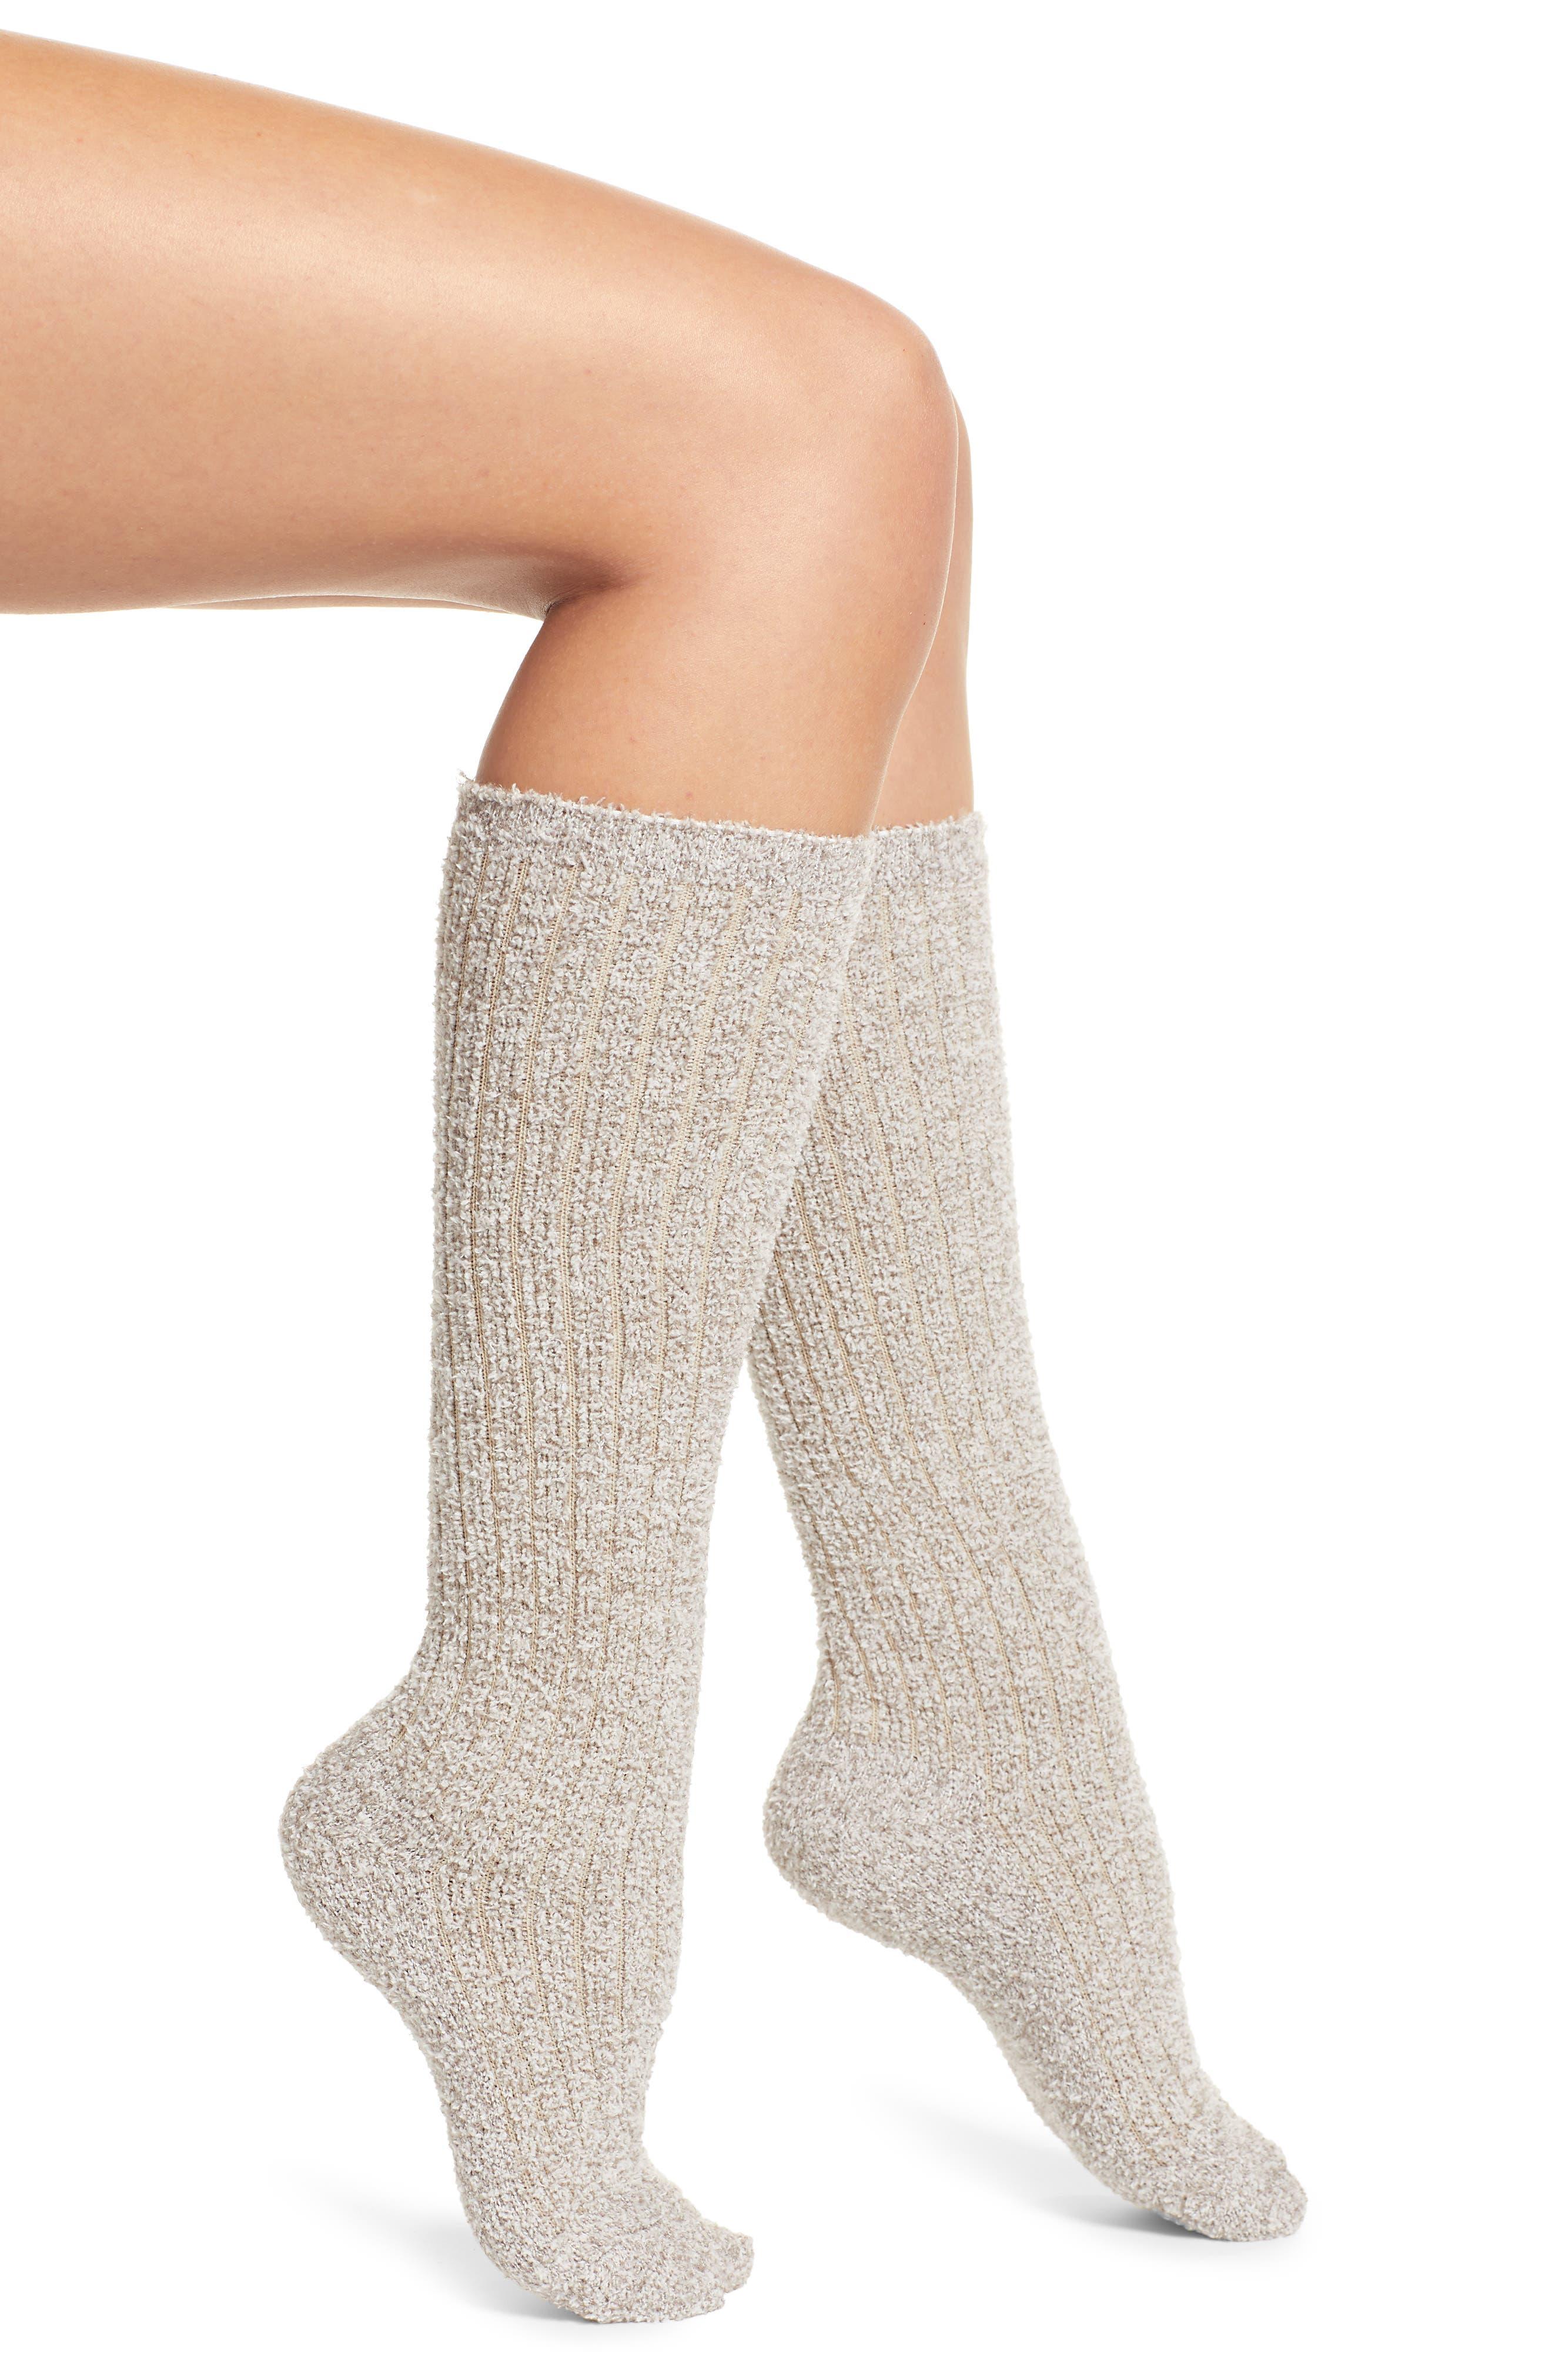 BAREFOOT DREAMS<SUP>®</SUP> CozyChic<sup>™</sup> Rib Knee High Socks, Main, color, HE BEACH ROCK/ ALMOND